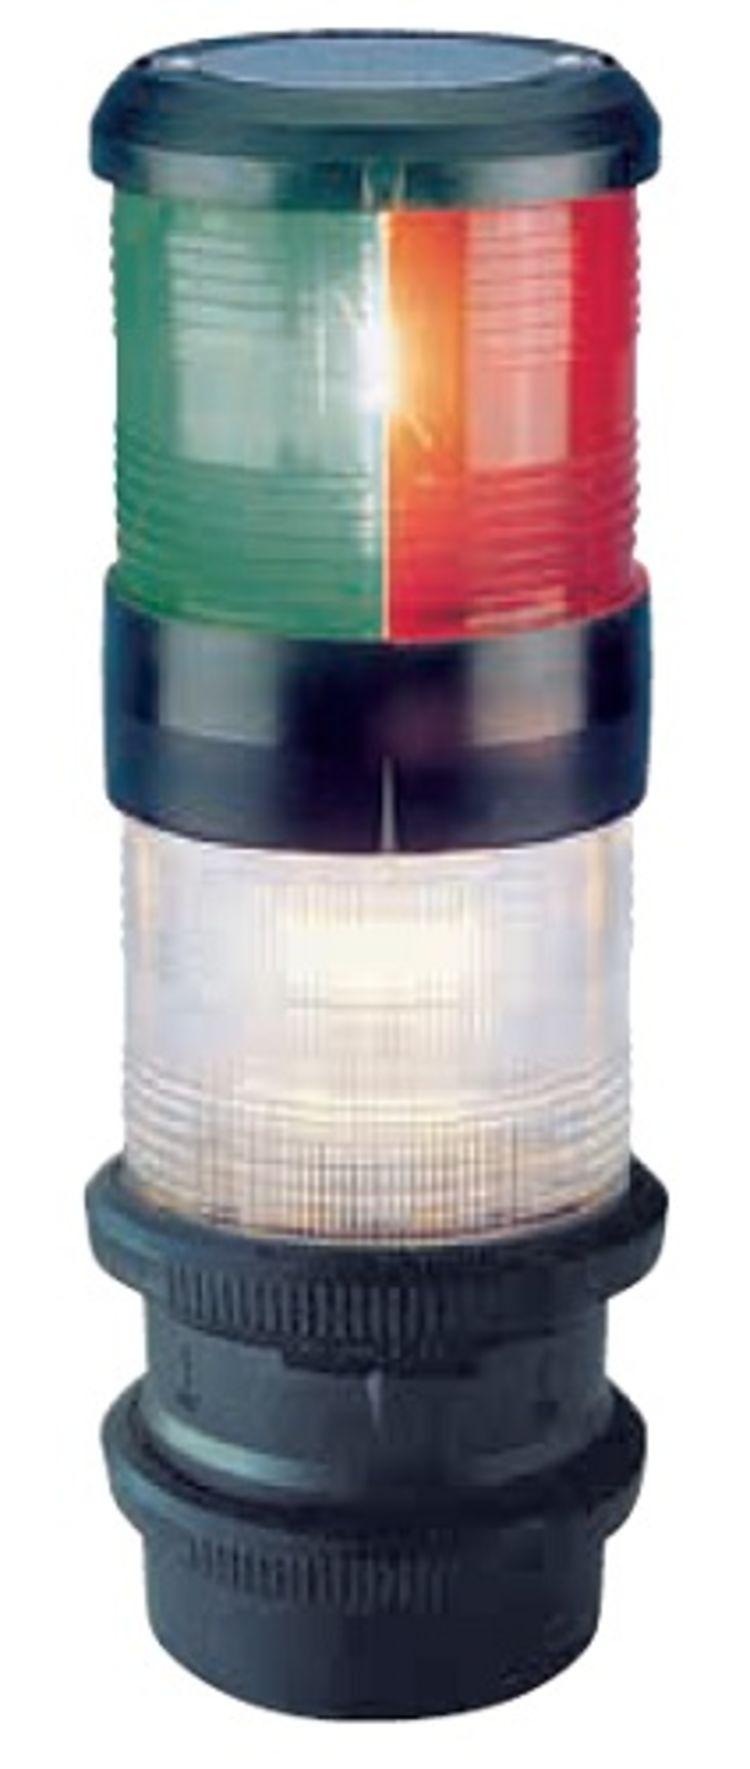 Replacement Lens for AQUASIGNAL 40 Tri-colour Anchor